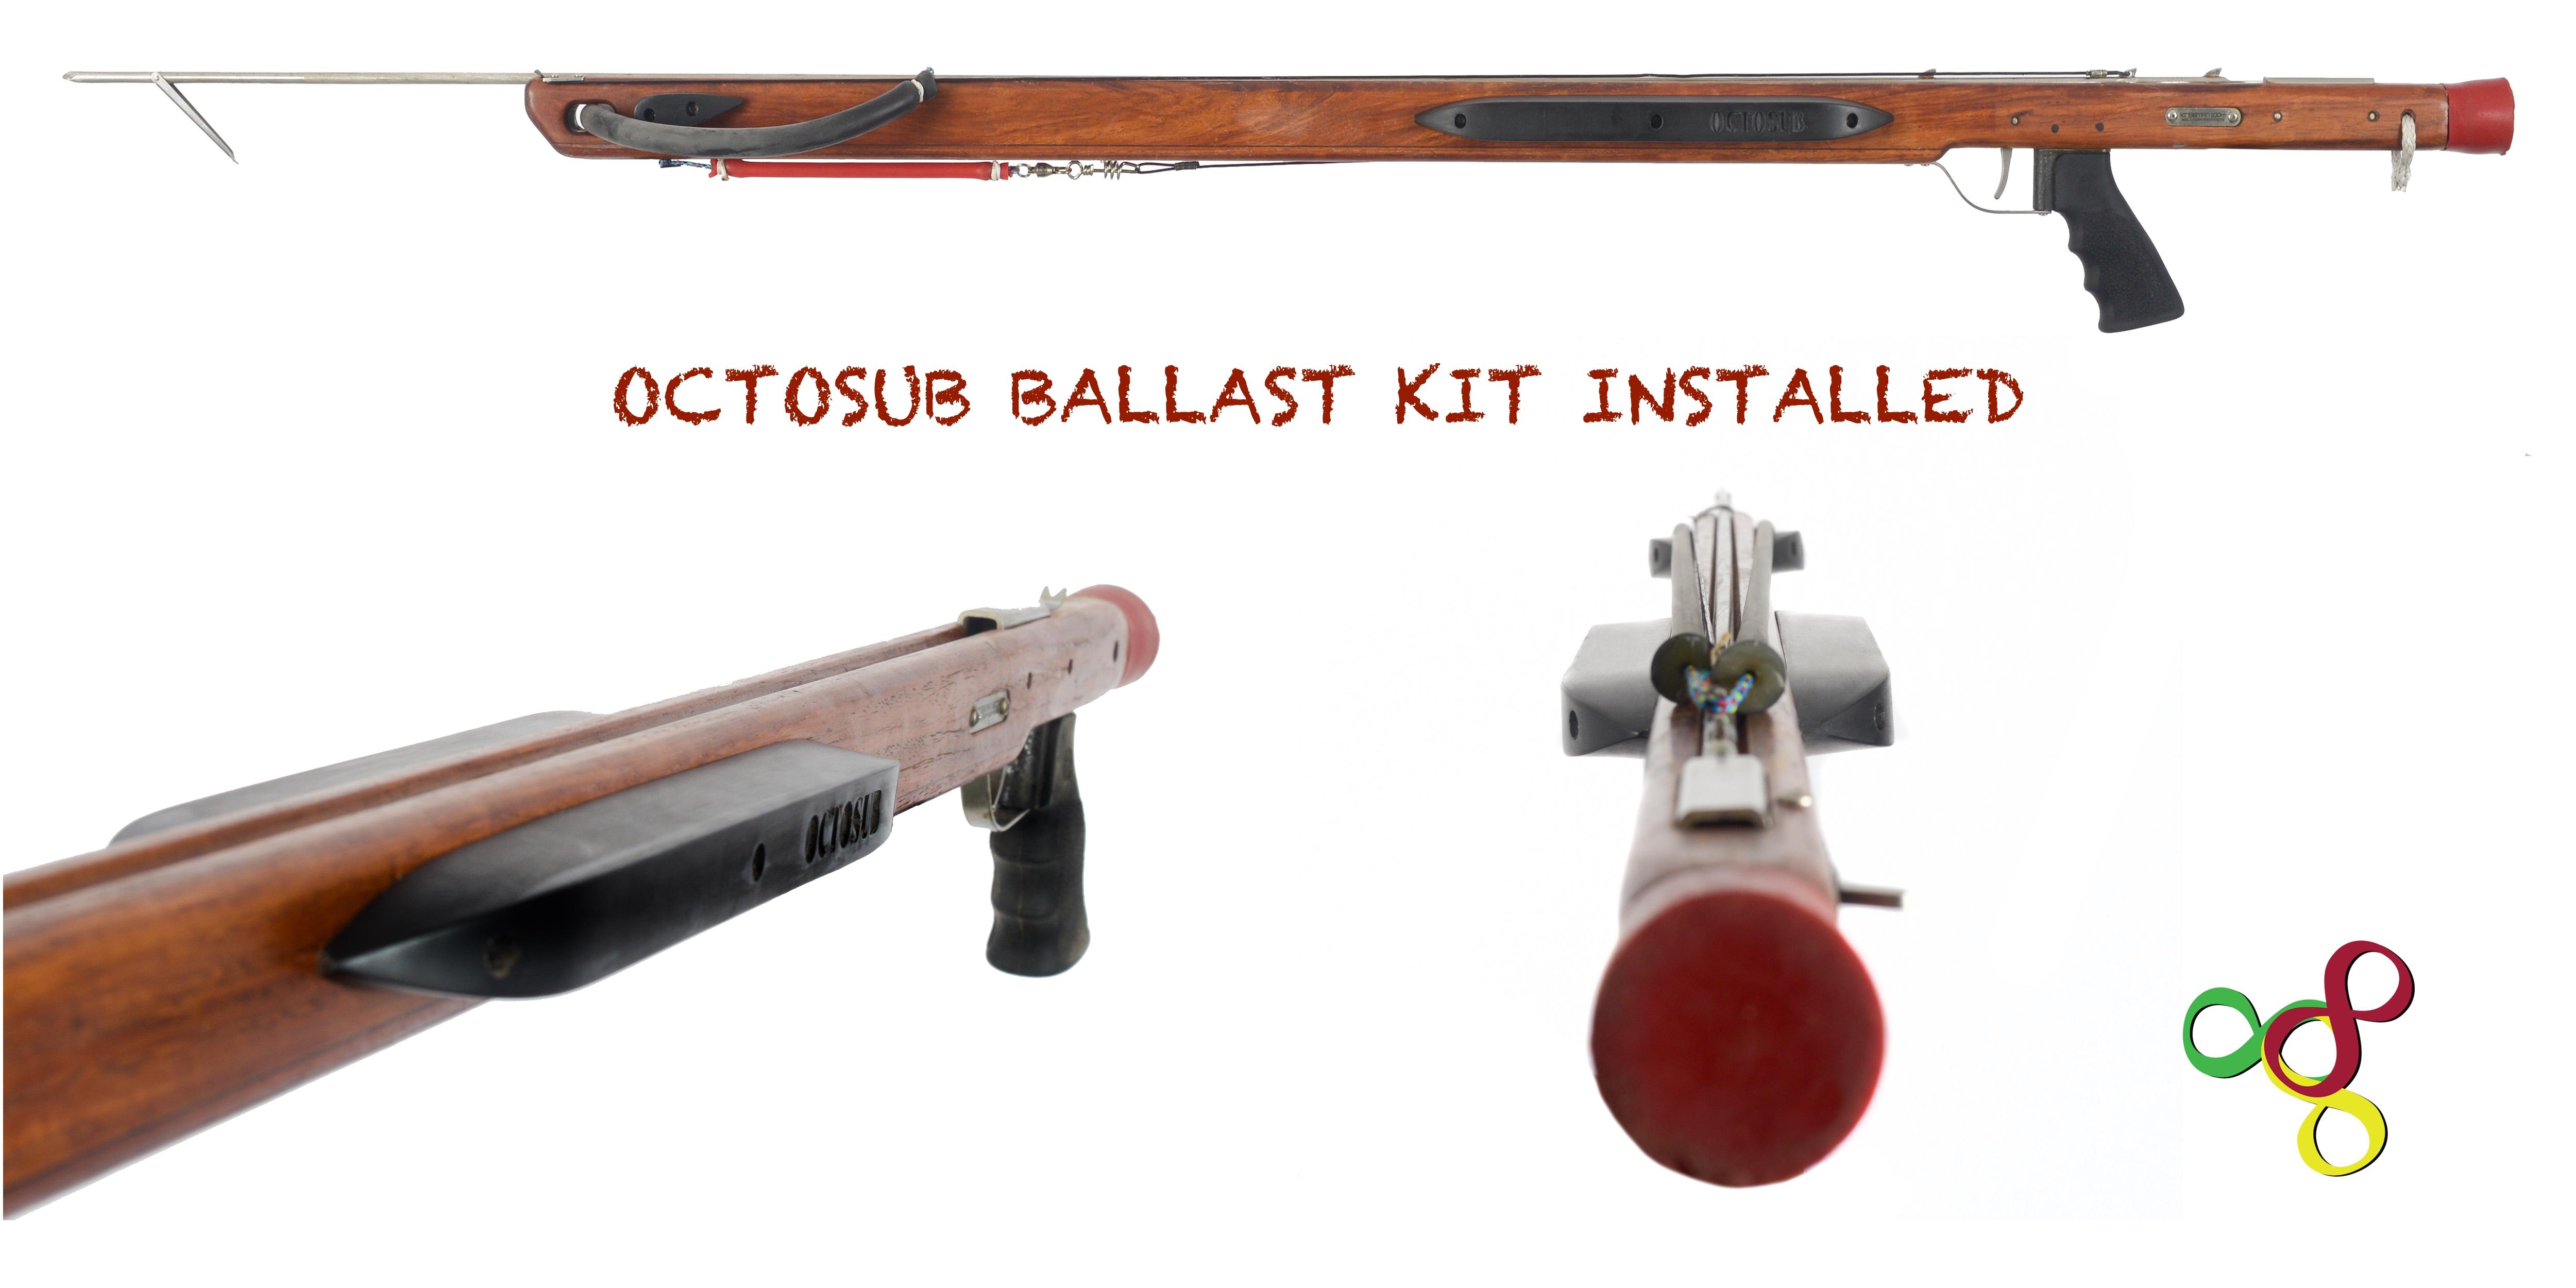 Octosub Speargun Ballast Kit